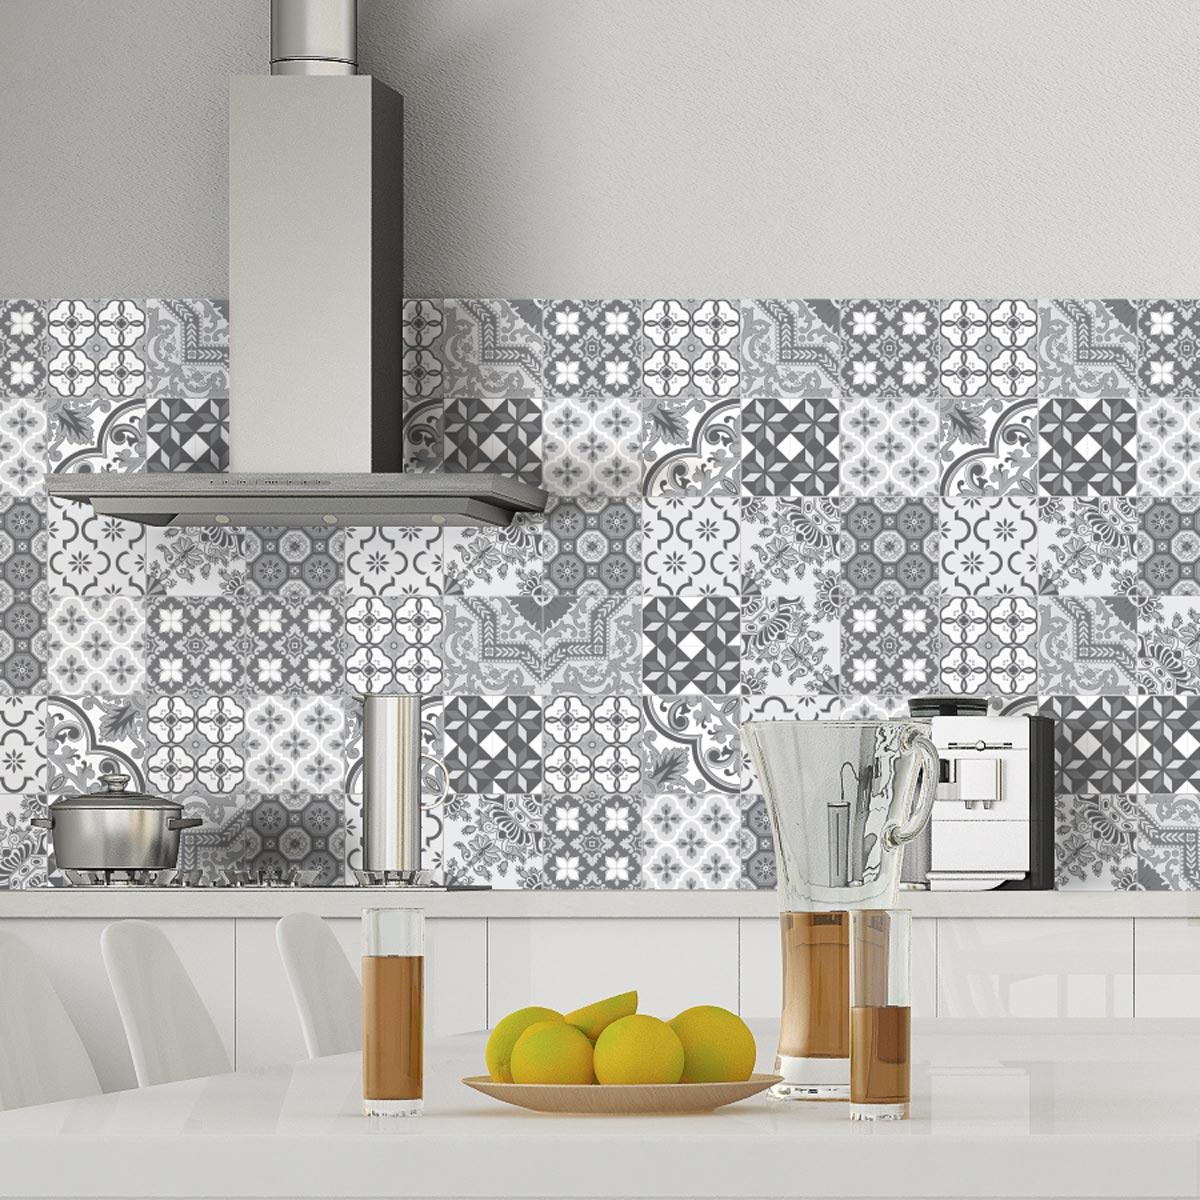 9 stickers carrelages azulejos nuances de gris monte carlo. Black Bedroom Furniture Sets. Home Design Ideas